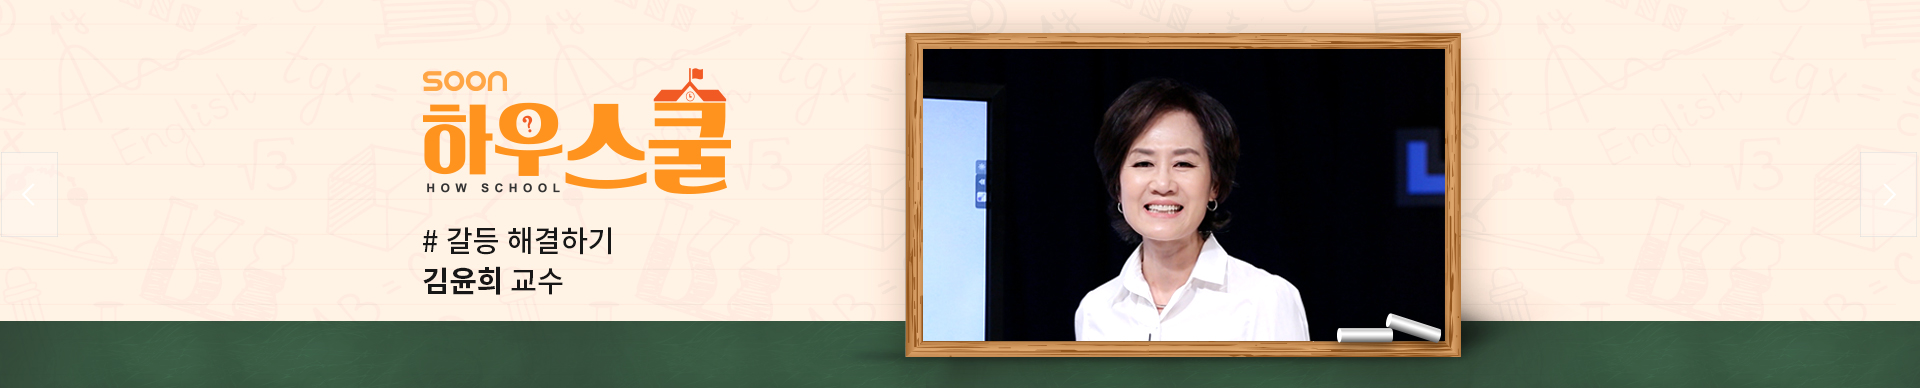 [SOON] 하우스쿨 : 갈등 해결하기_김윤희 교수